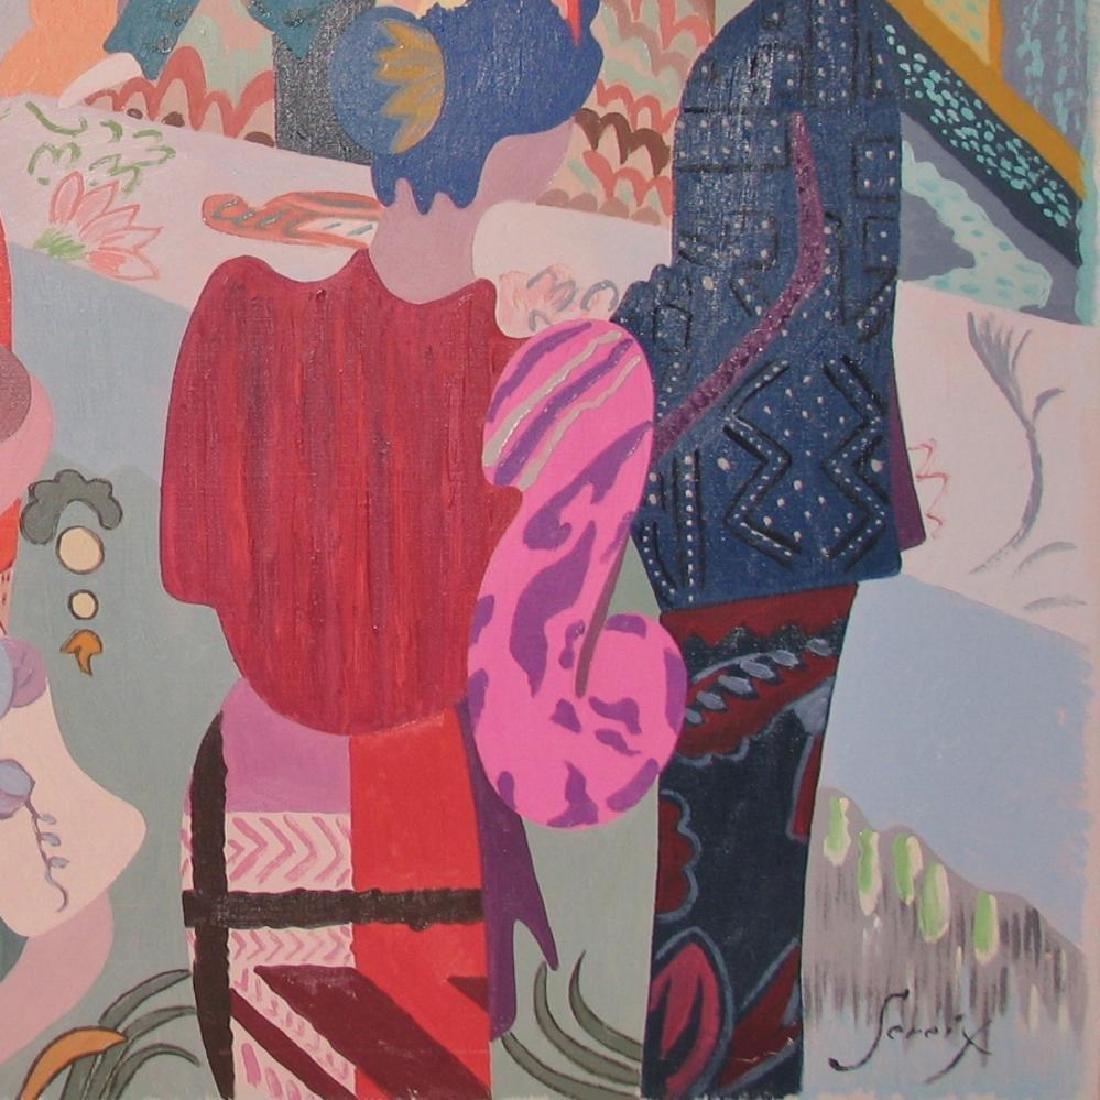 Antonio Sereix Matinee Original Painting on Canvas - 4